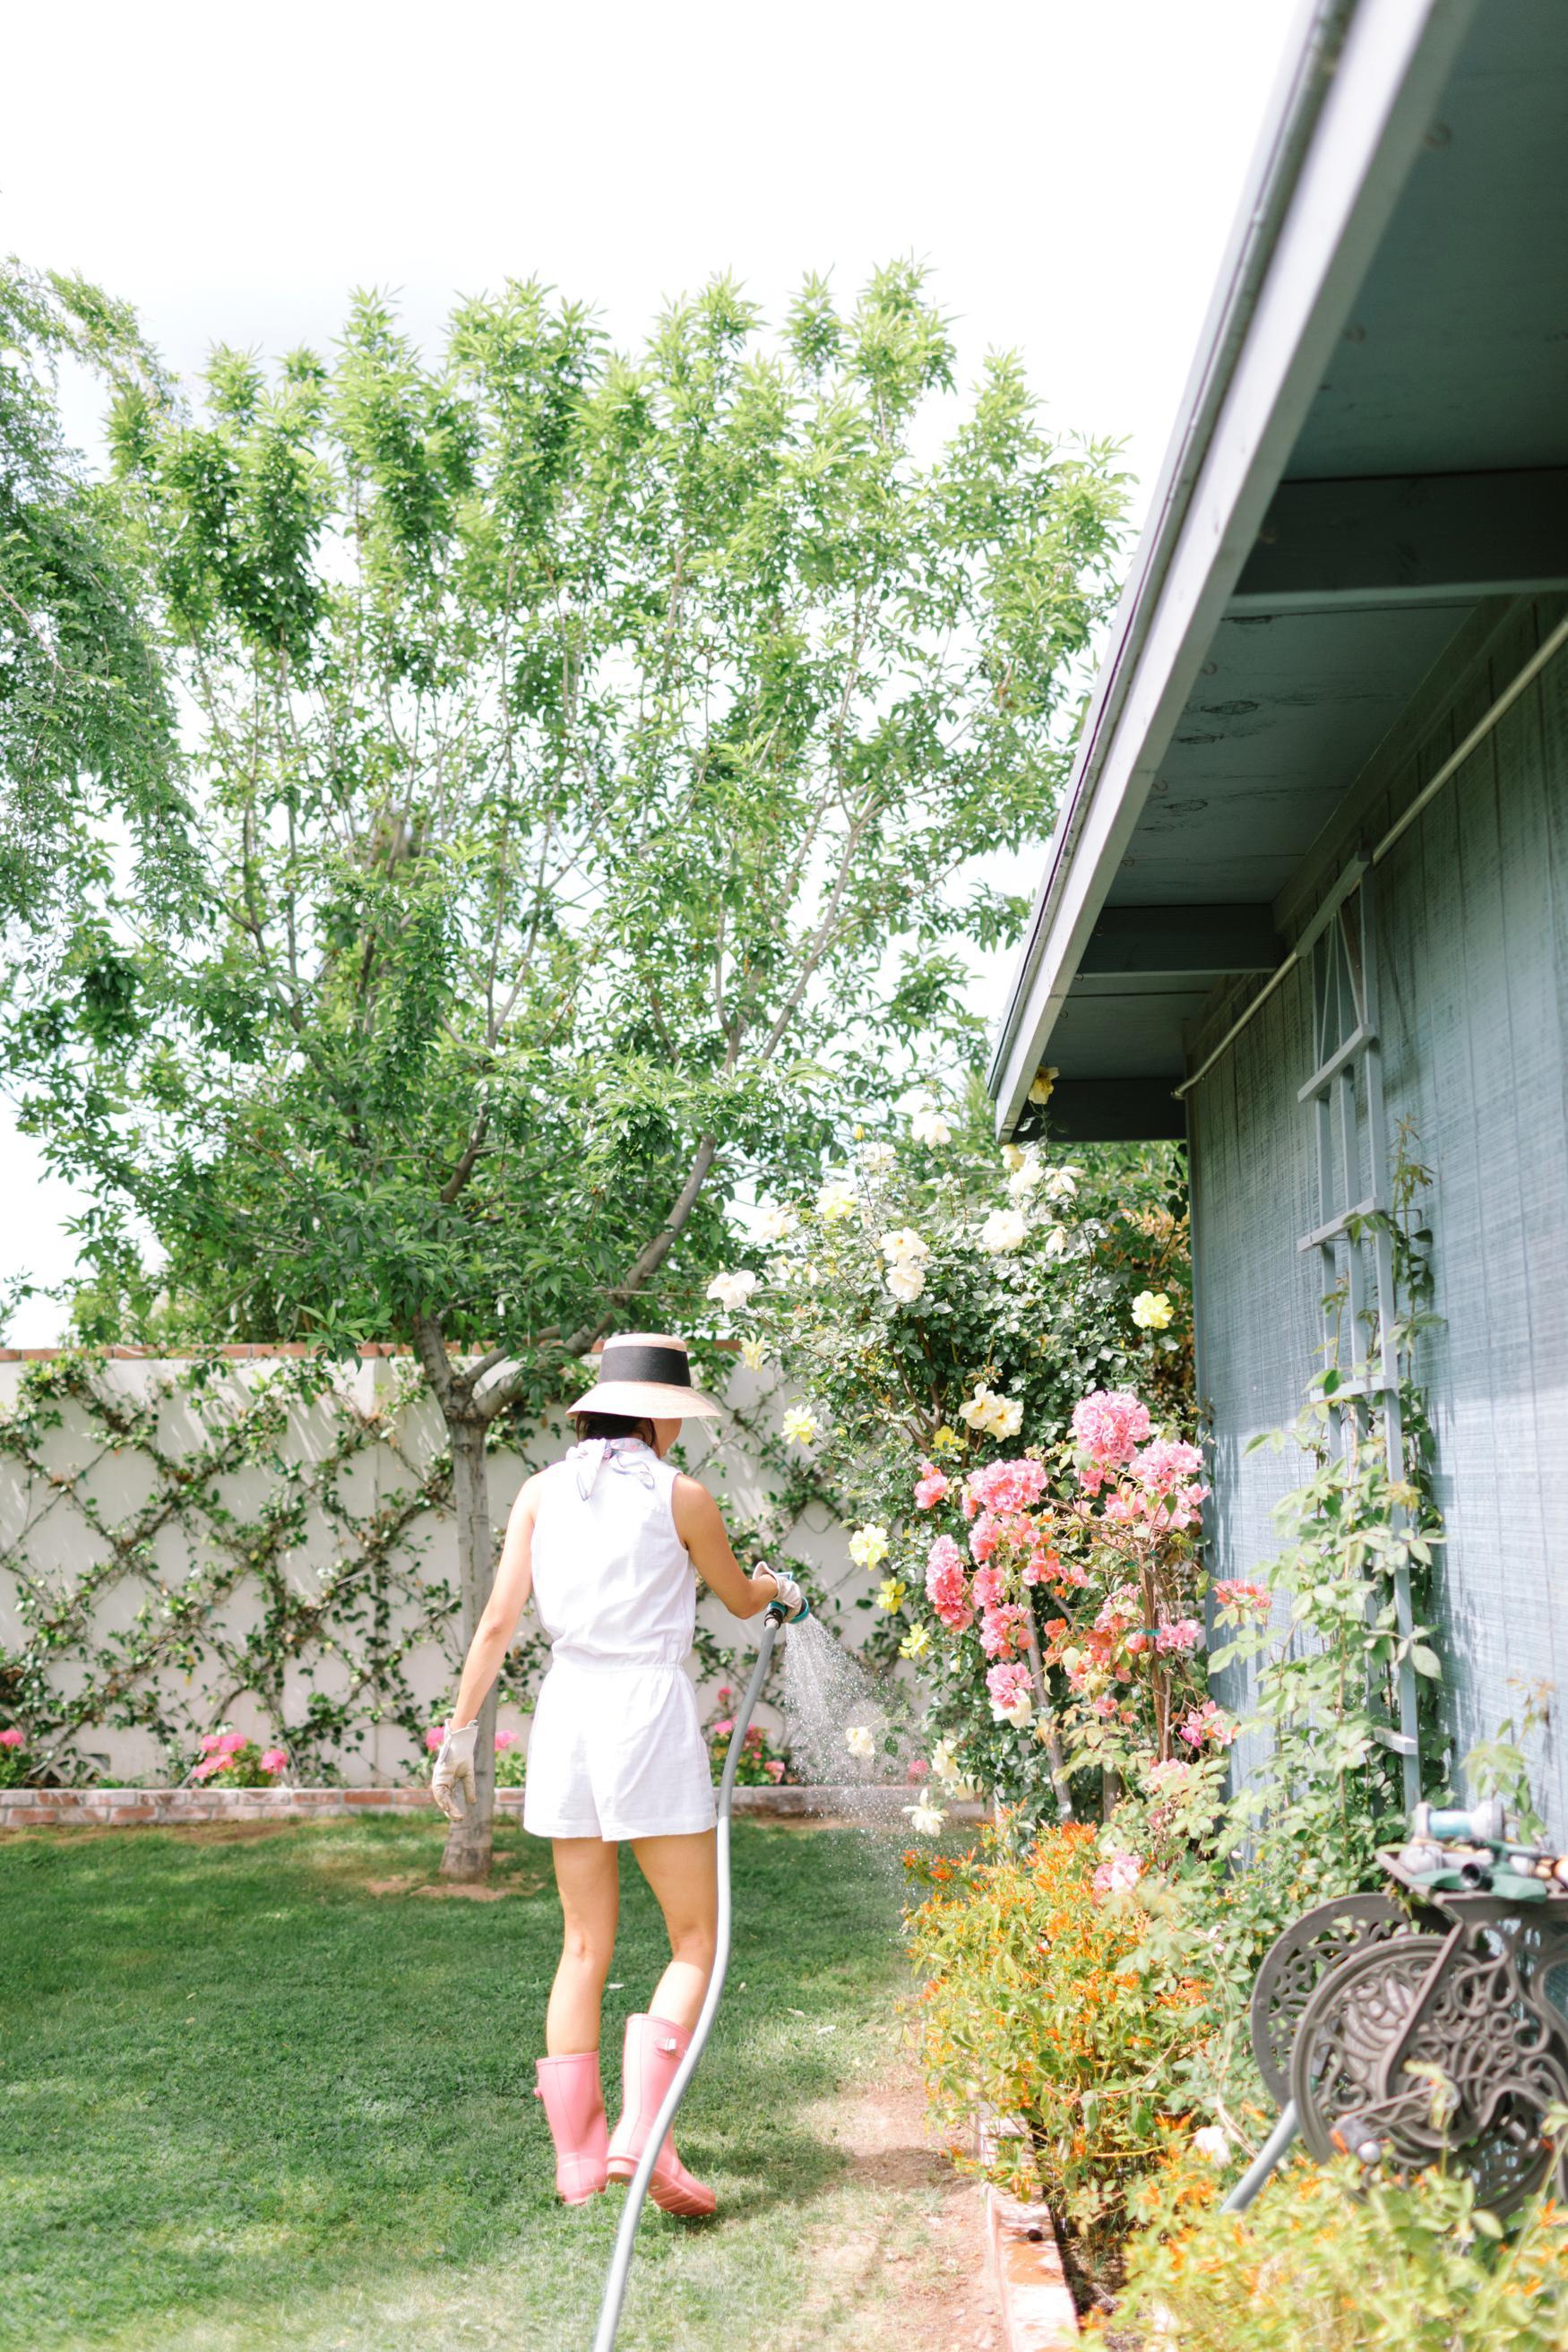 Into the backyard garden jasmine wall espalier vine with Fiskars Gilmour tools